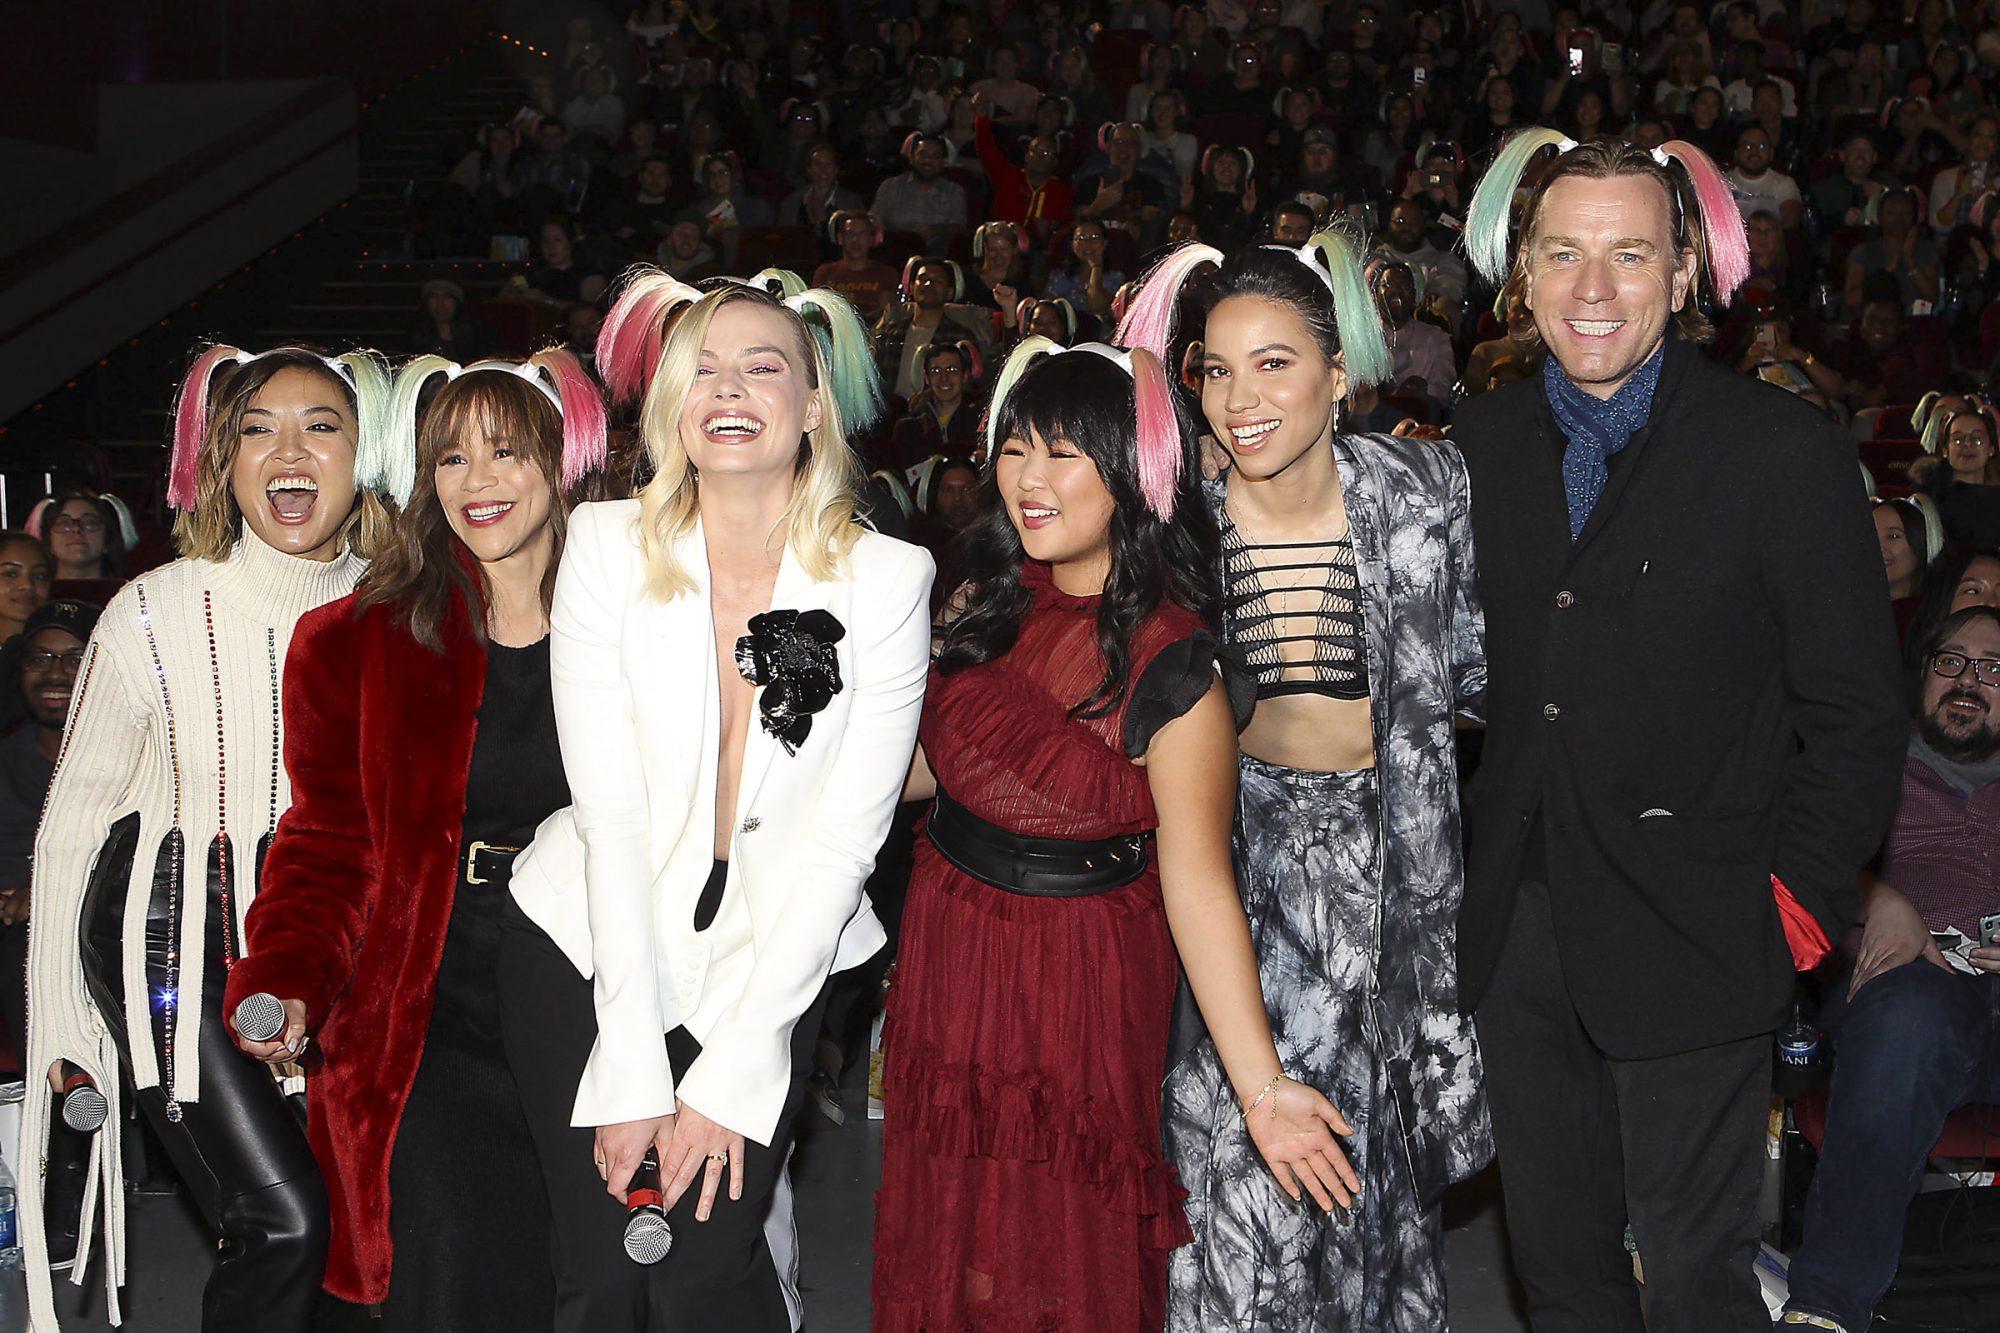 Cathy Yan, Rosie Perez, Margot Robbie, Ella Jay Basco, Jurnee Smollett-Bell, Ewan McGregor